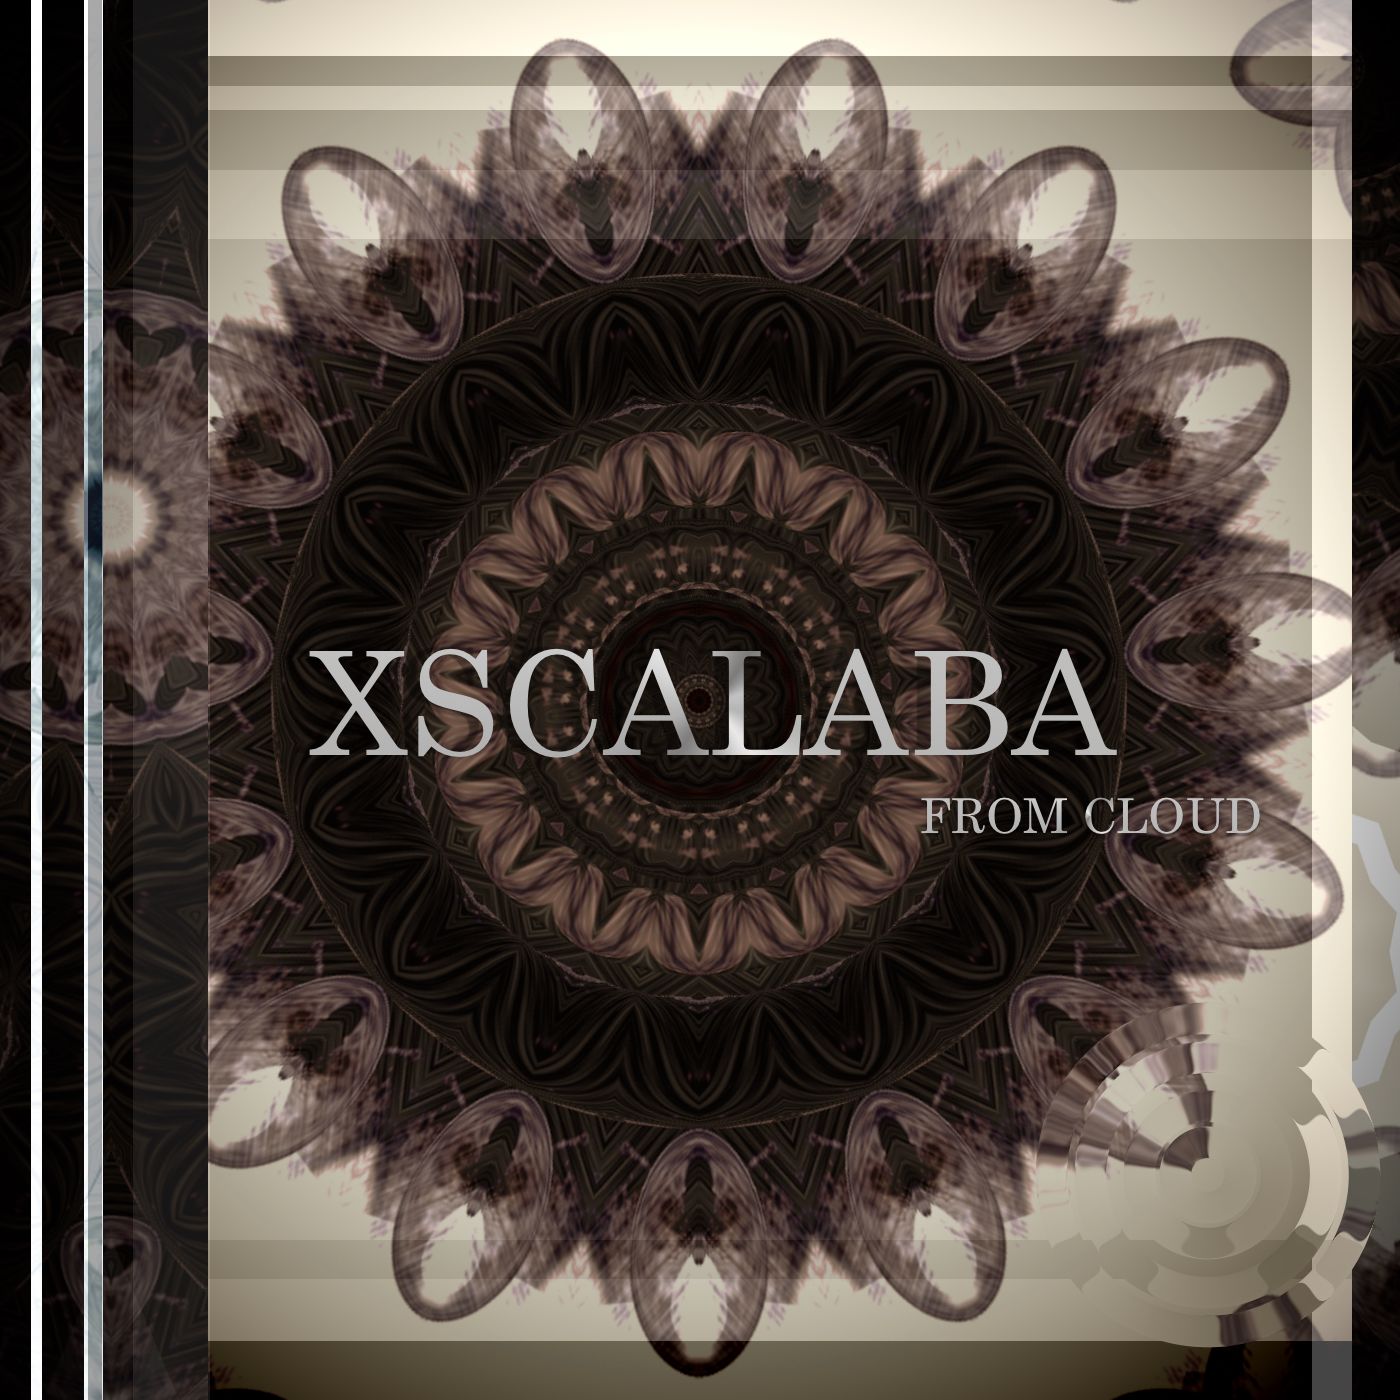 Xscalaba: School of Training